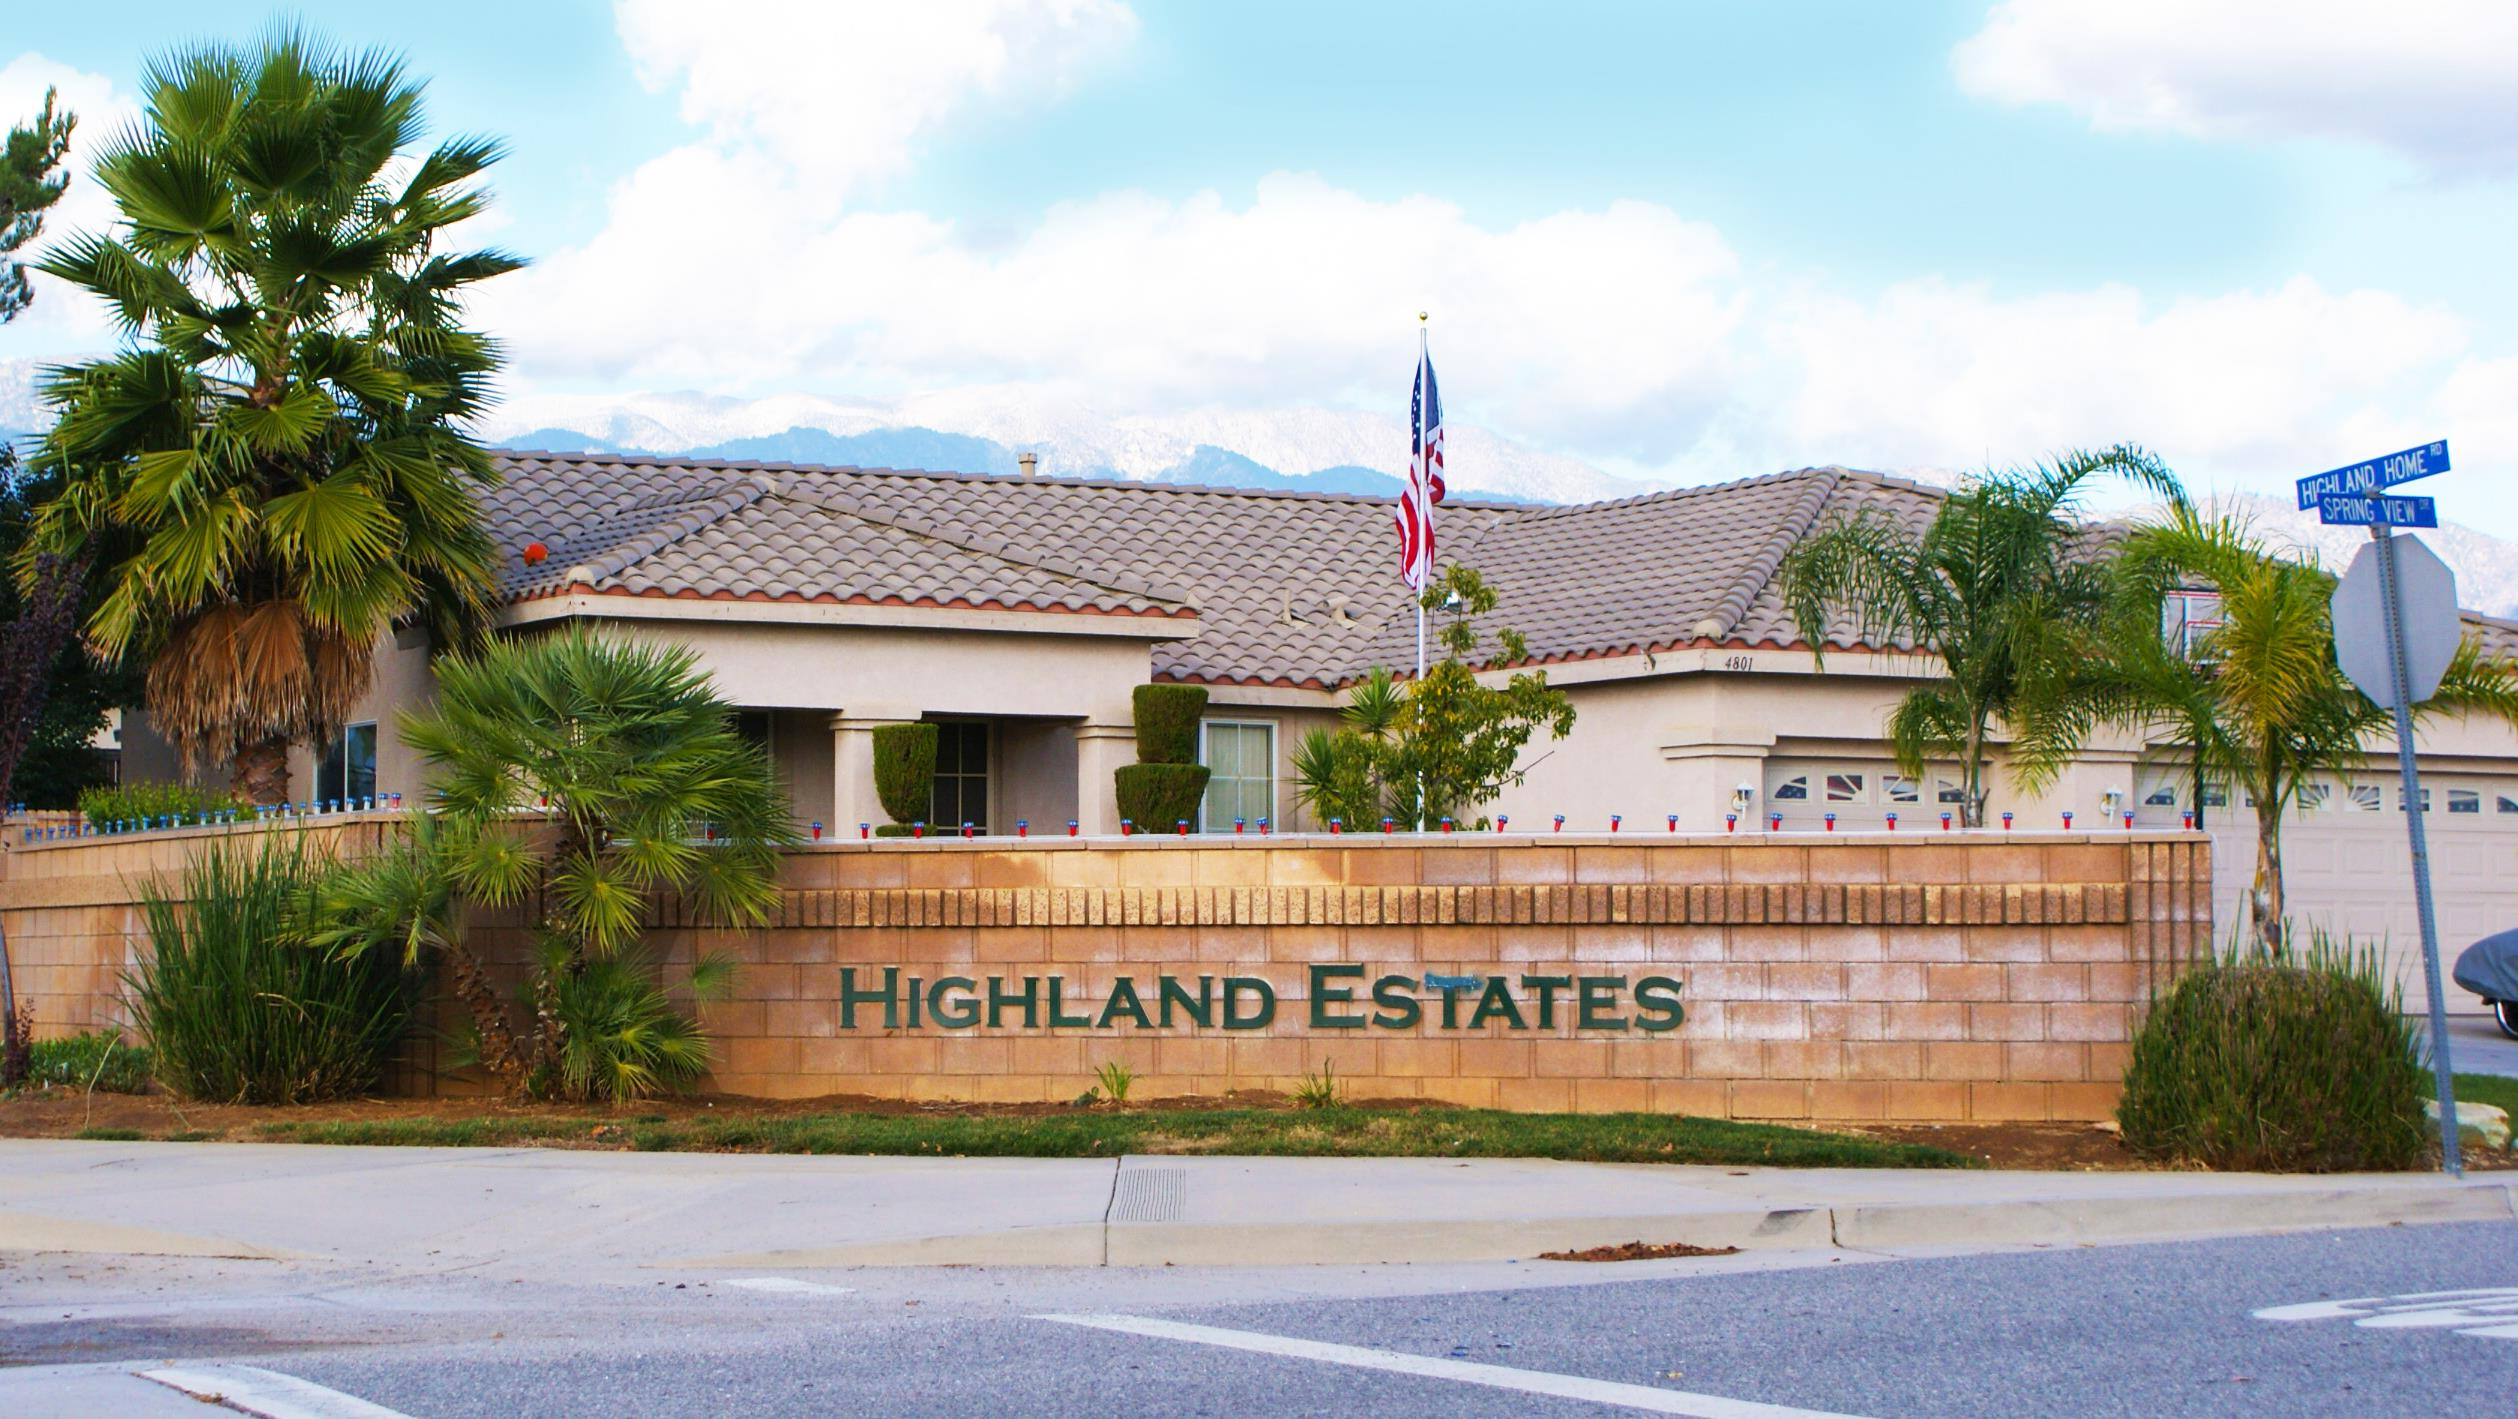 Highland Estates